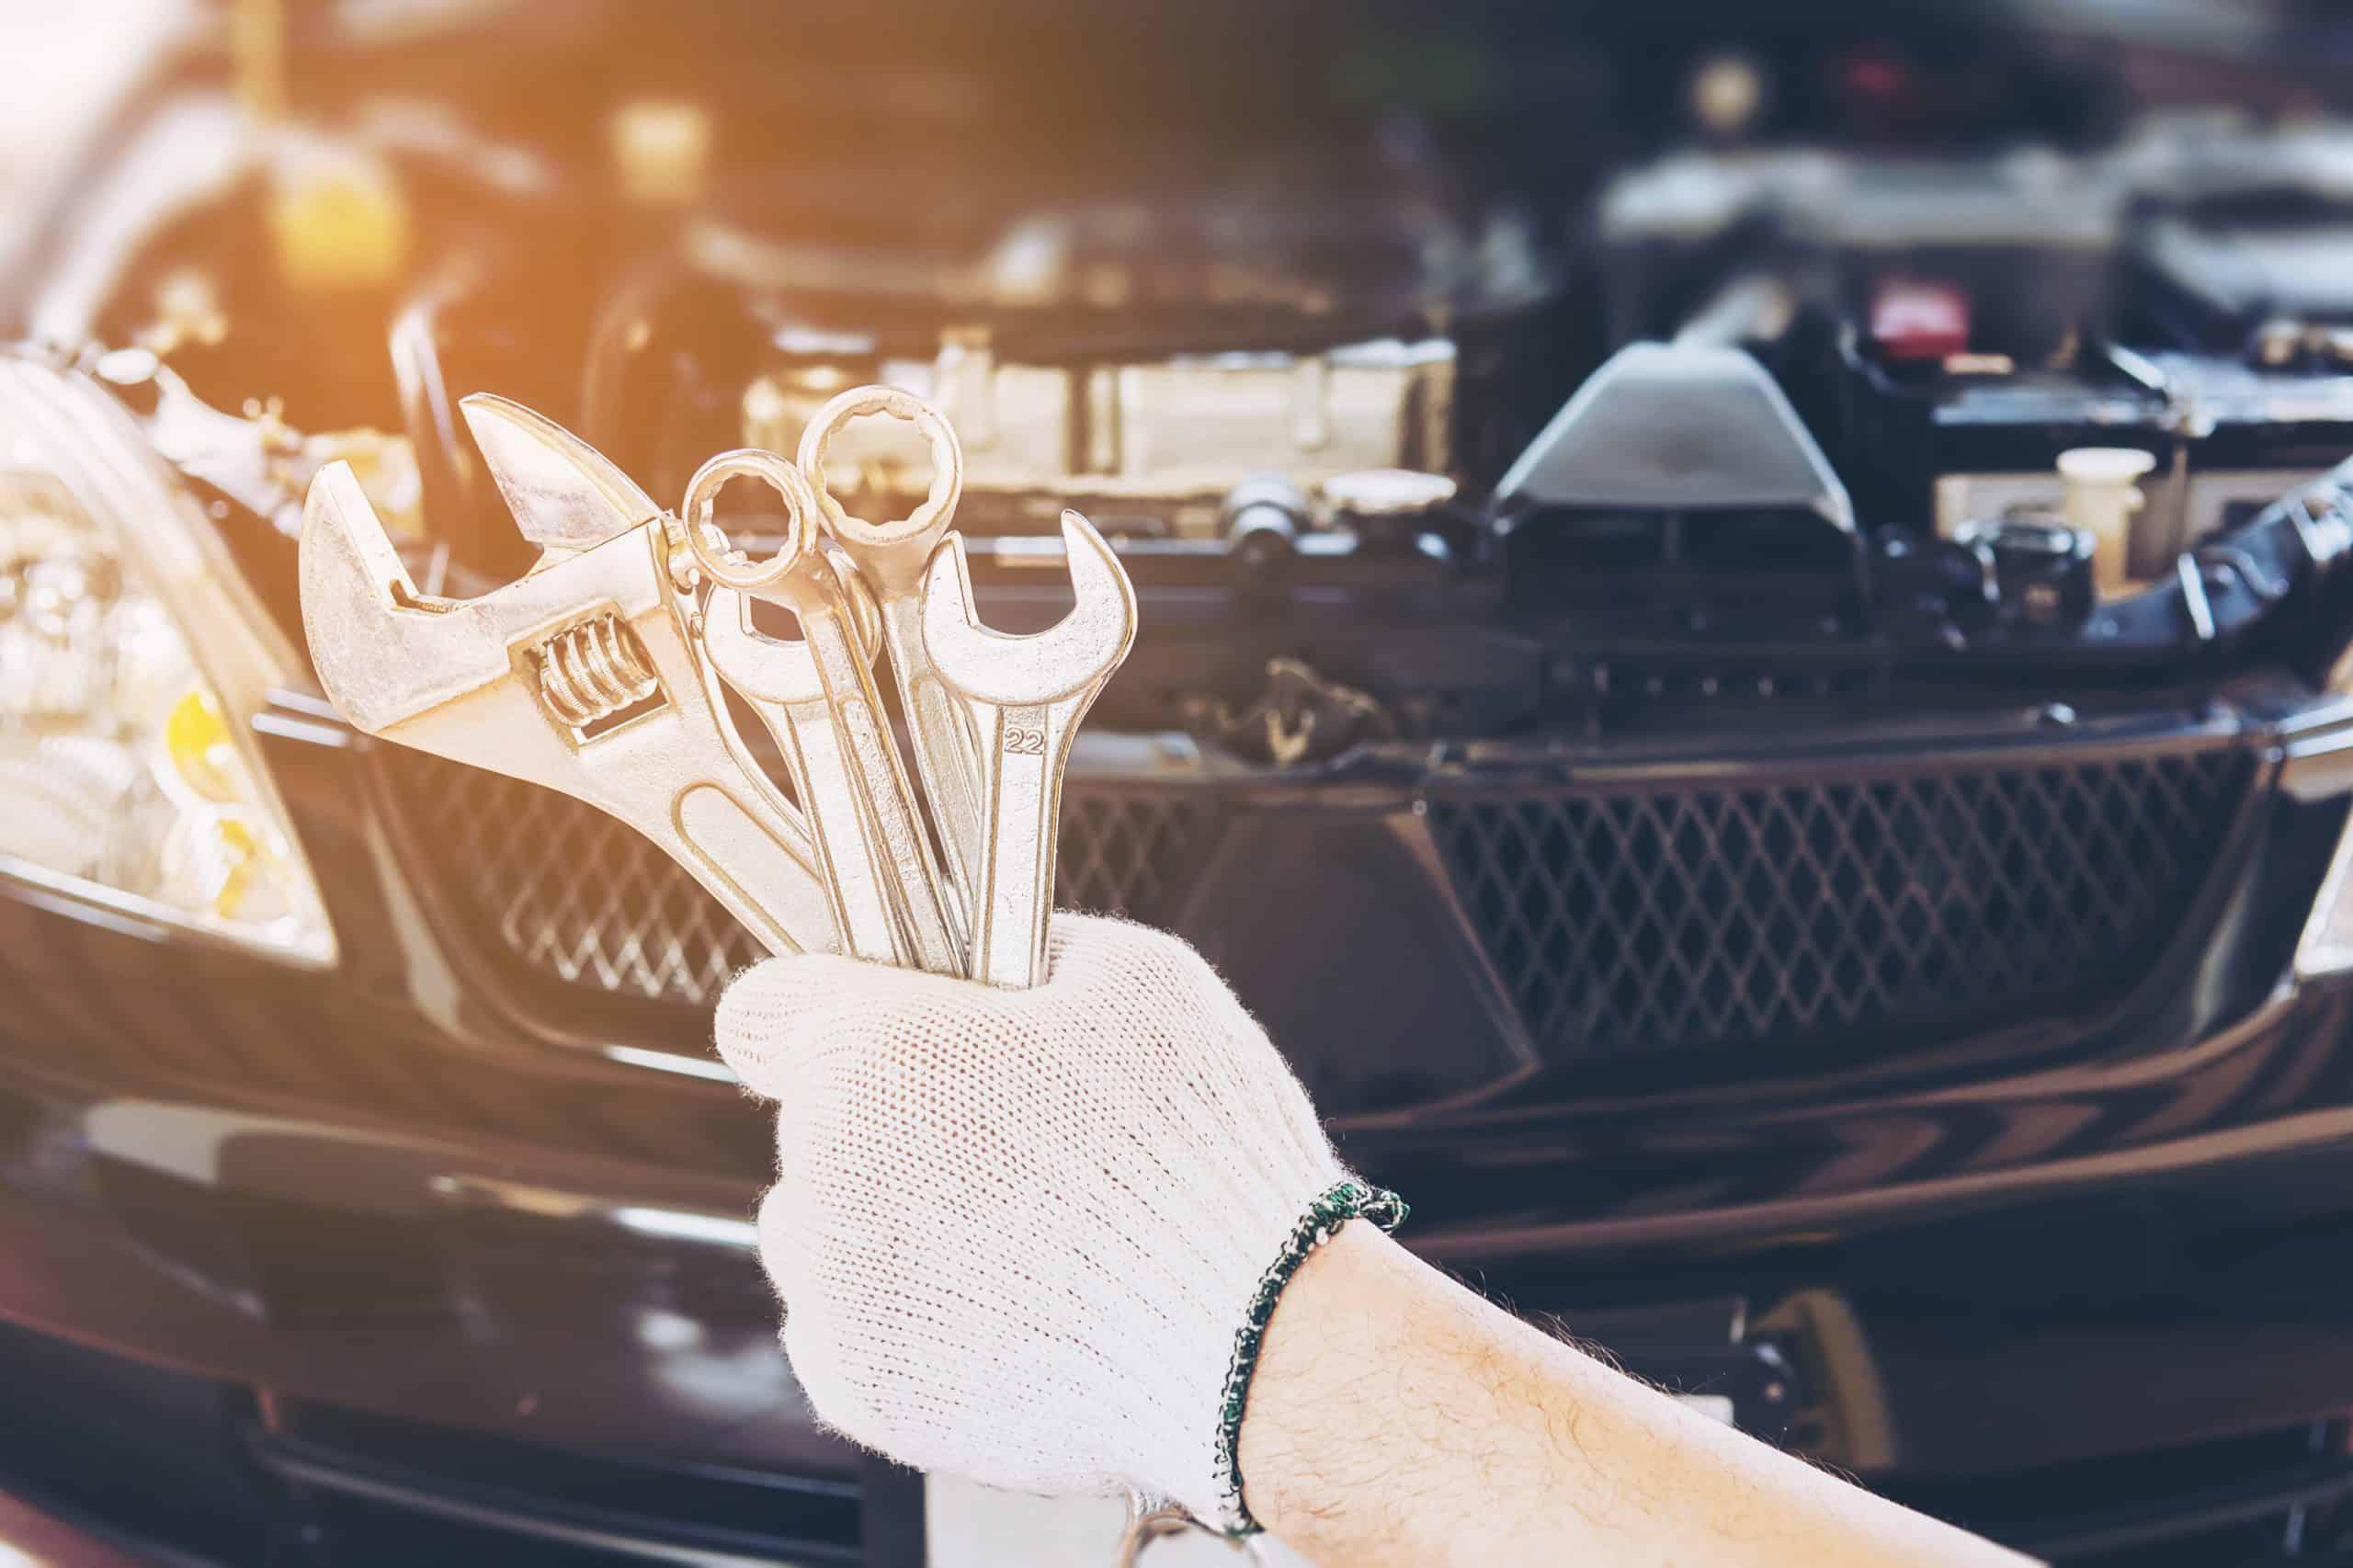 Service Auto: Black Auto Cluj, Asistenta Daune, ITP, Service Auto Cluj 2020